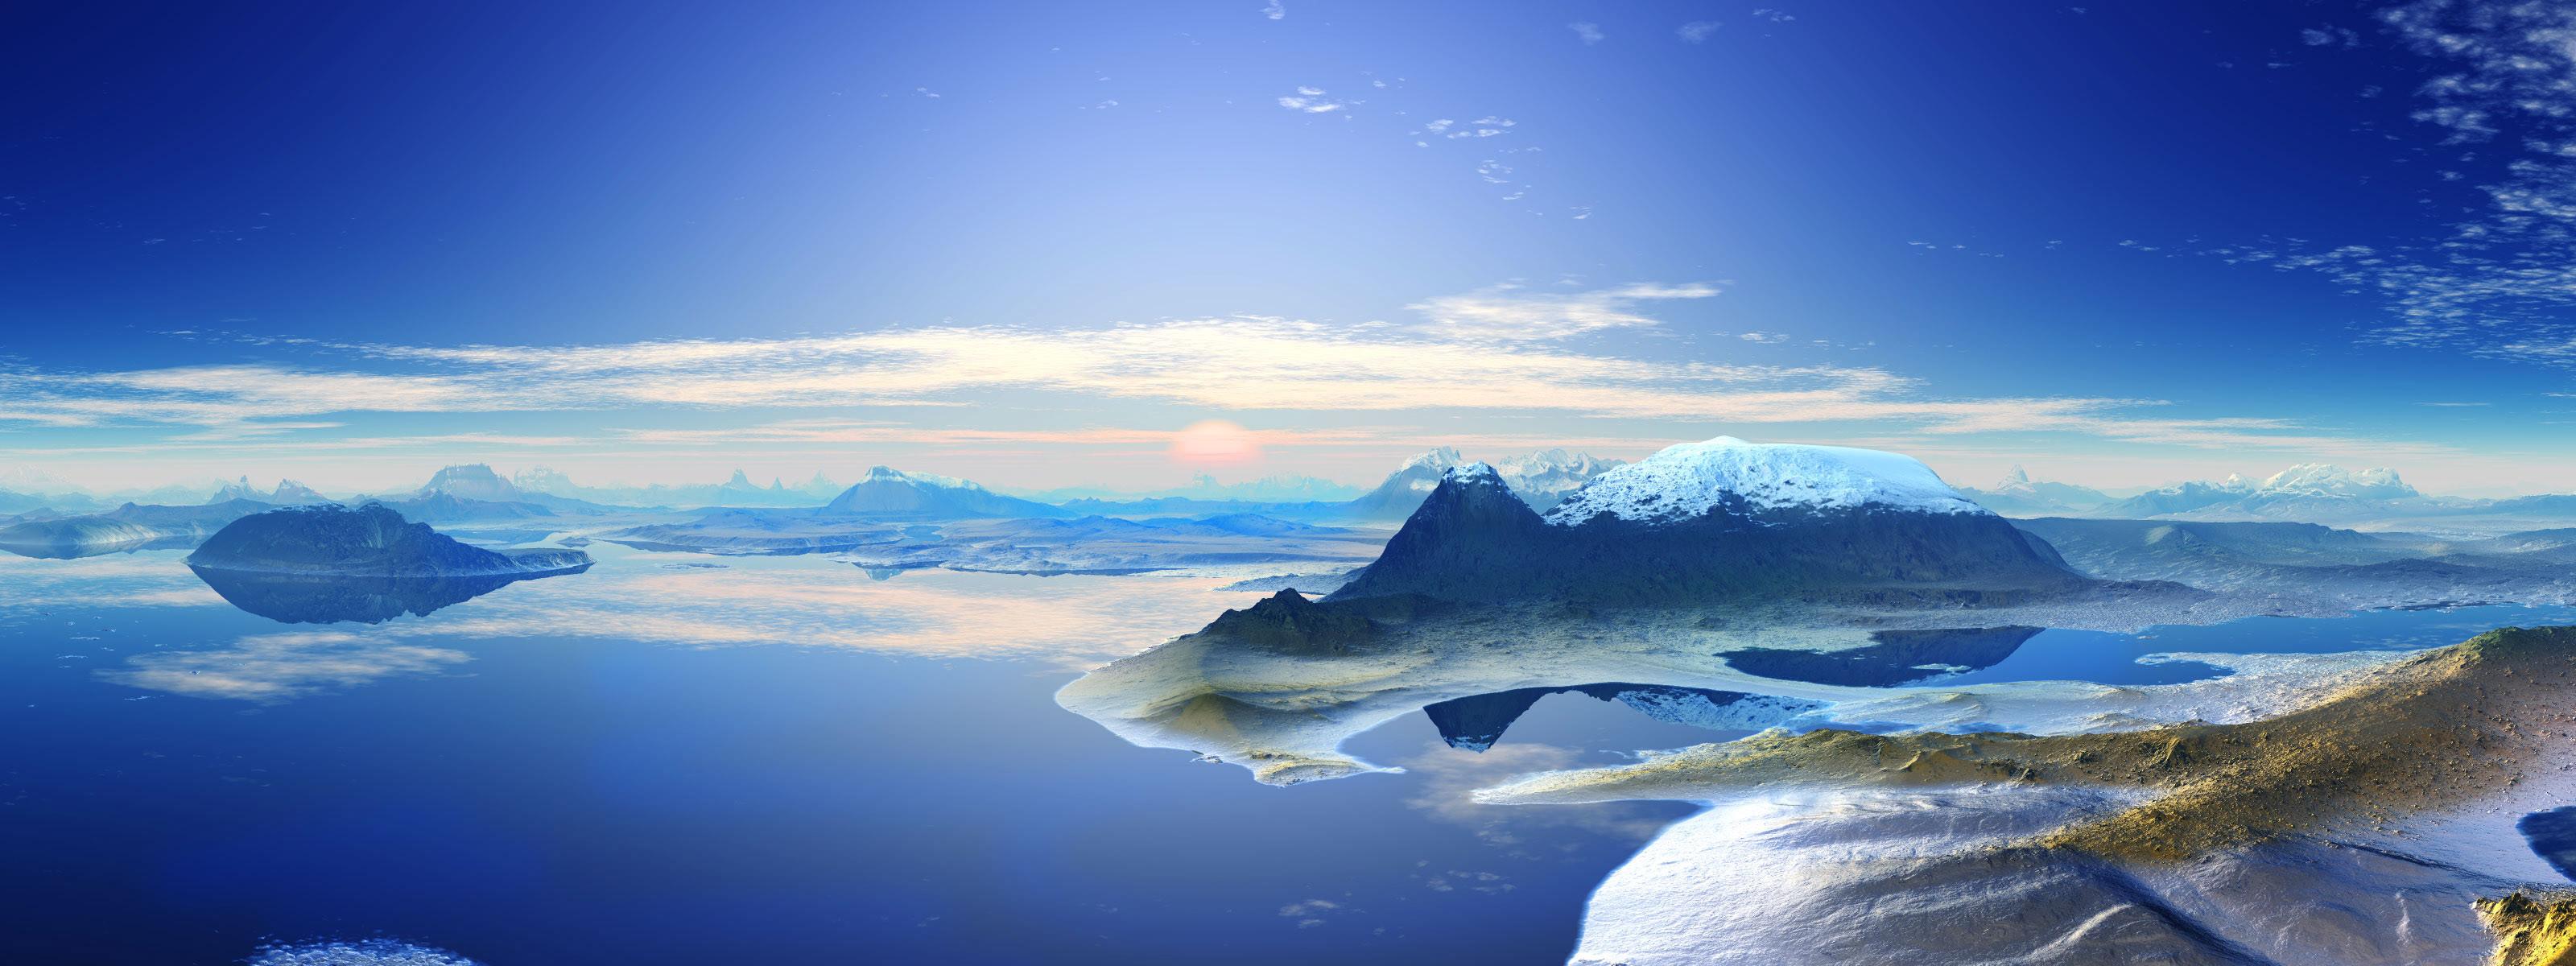 Antarctica Mountain Backgrounds   dual monitor wallpaper-wallpaper